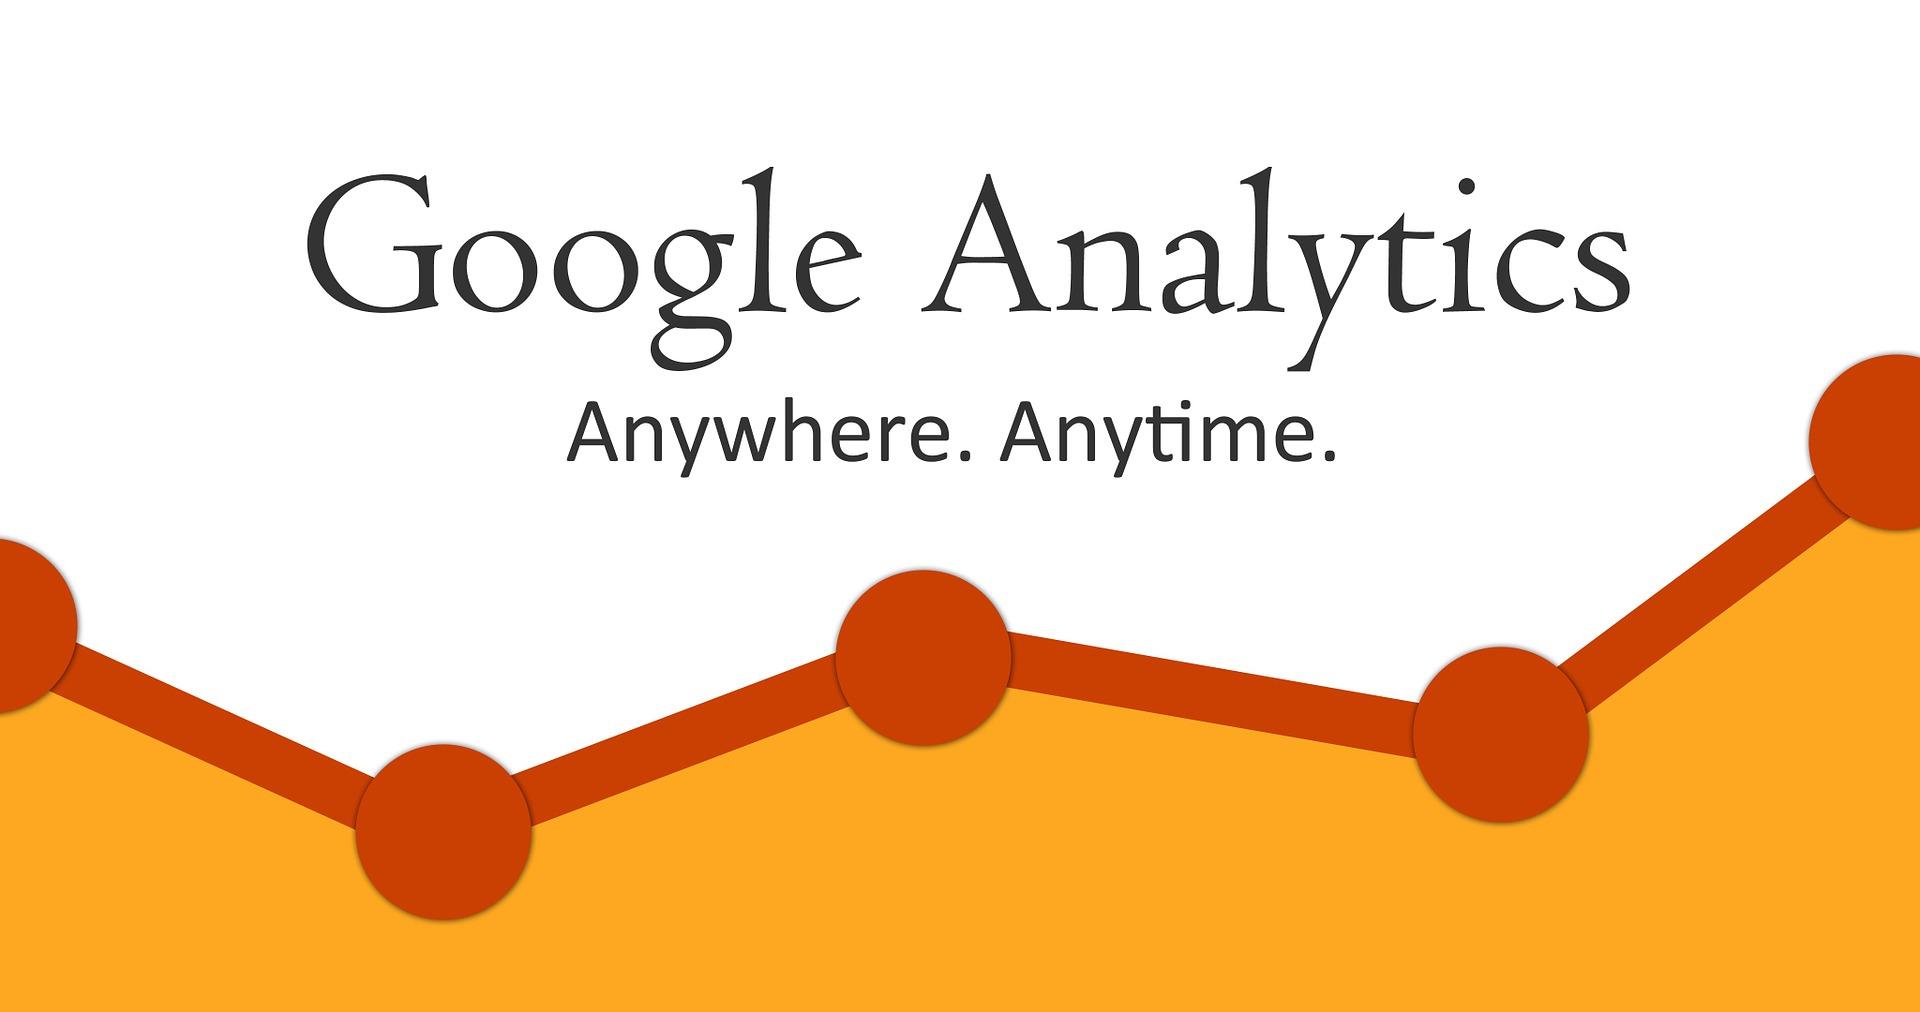 How to Track Website Traffic Using Google Analytics